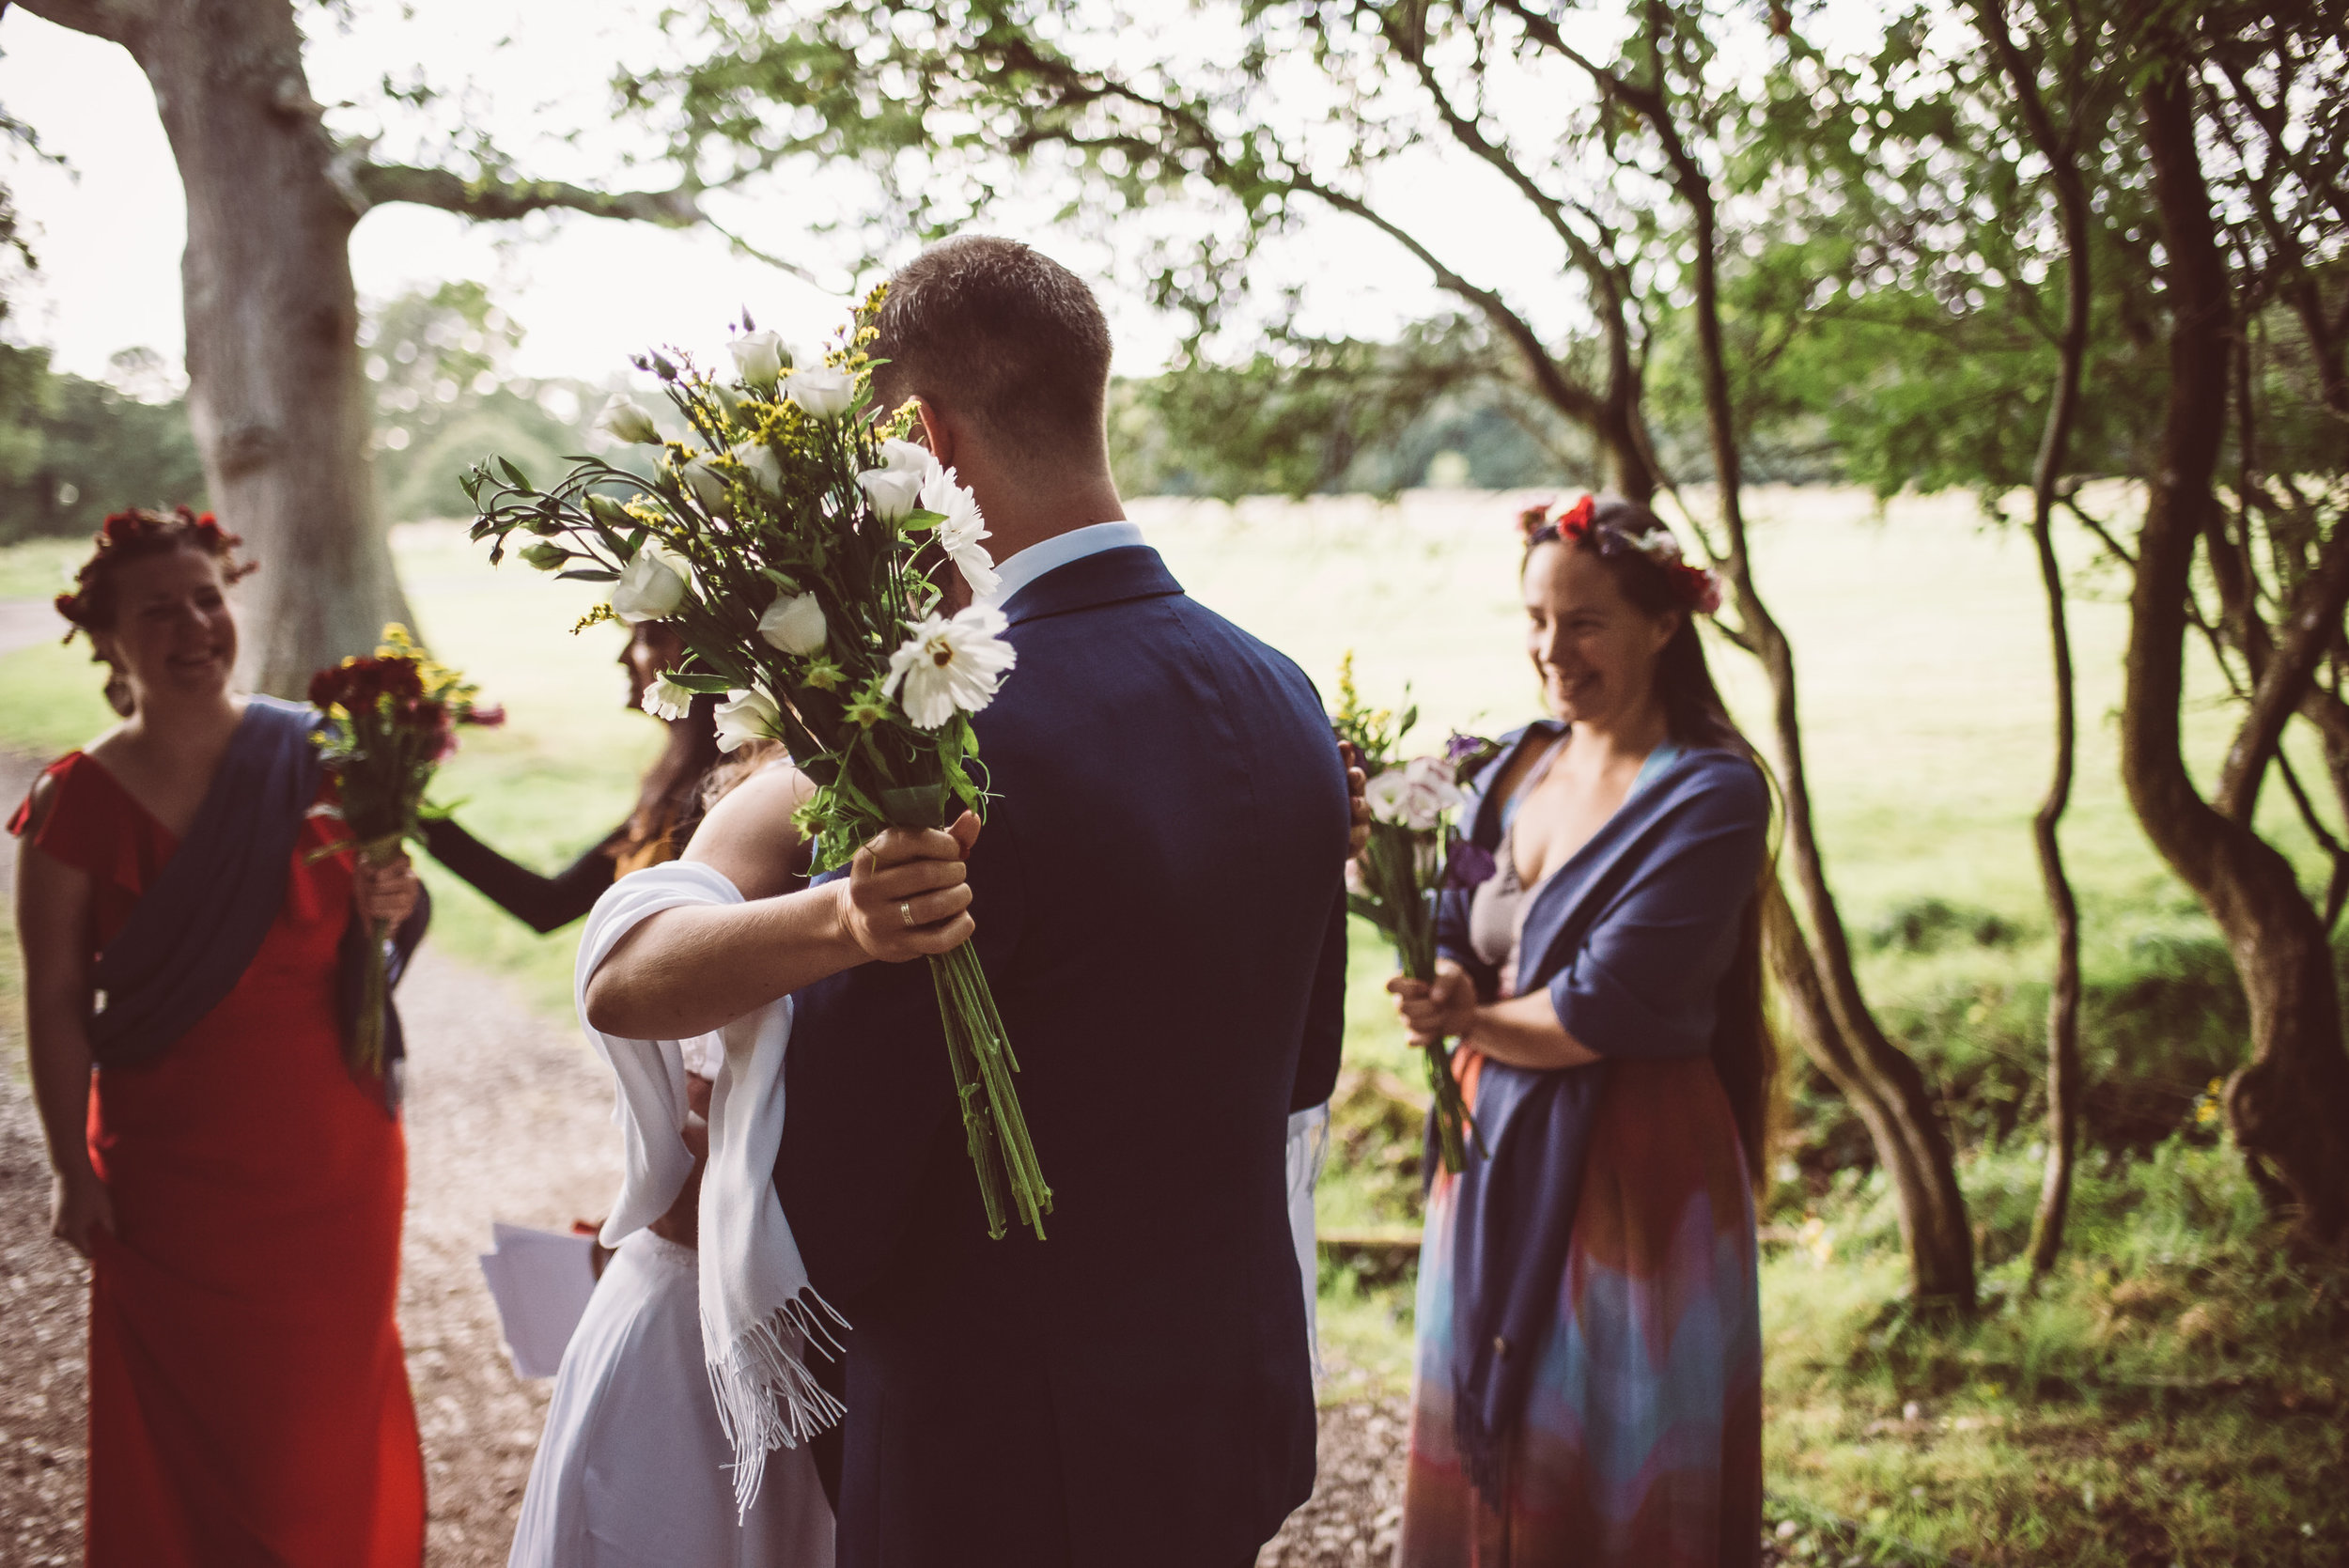 knepp-castle-boho-outdoor-wedding-120.jpg